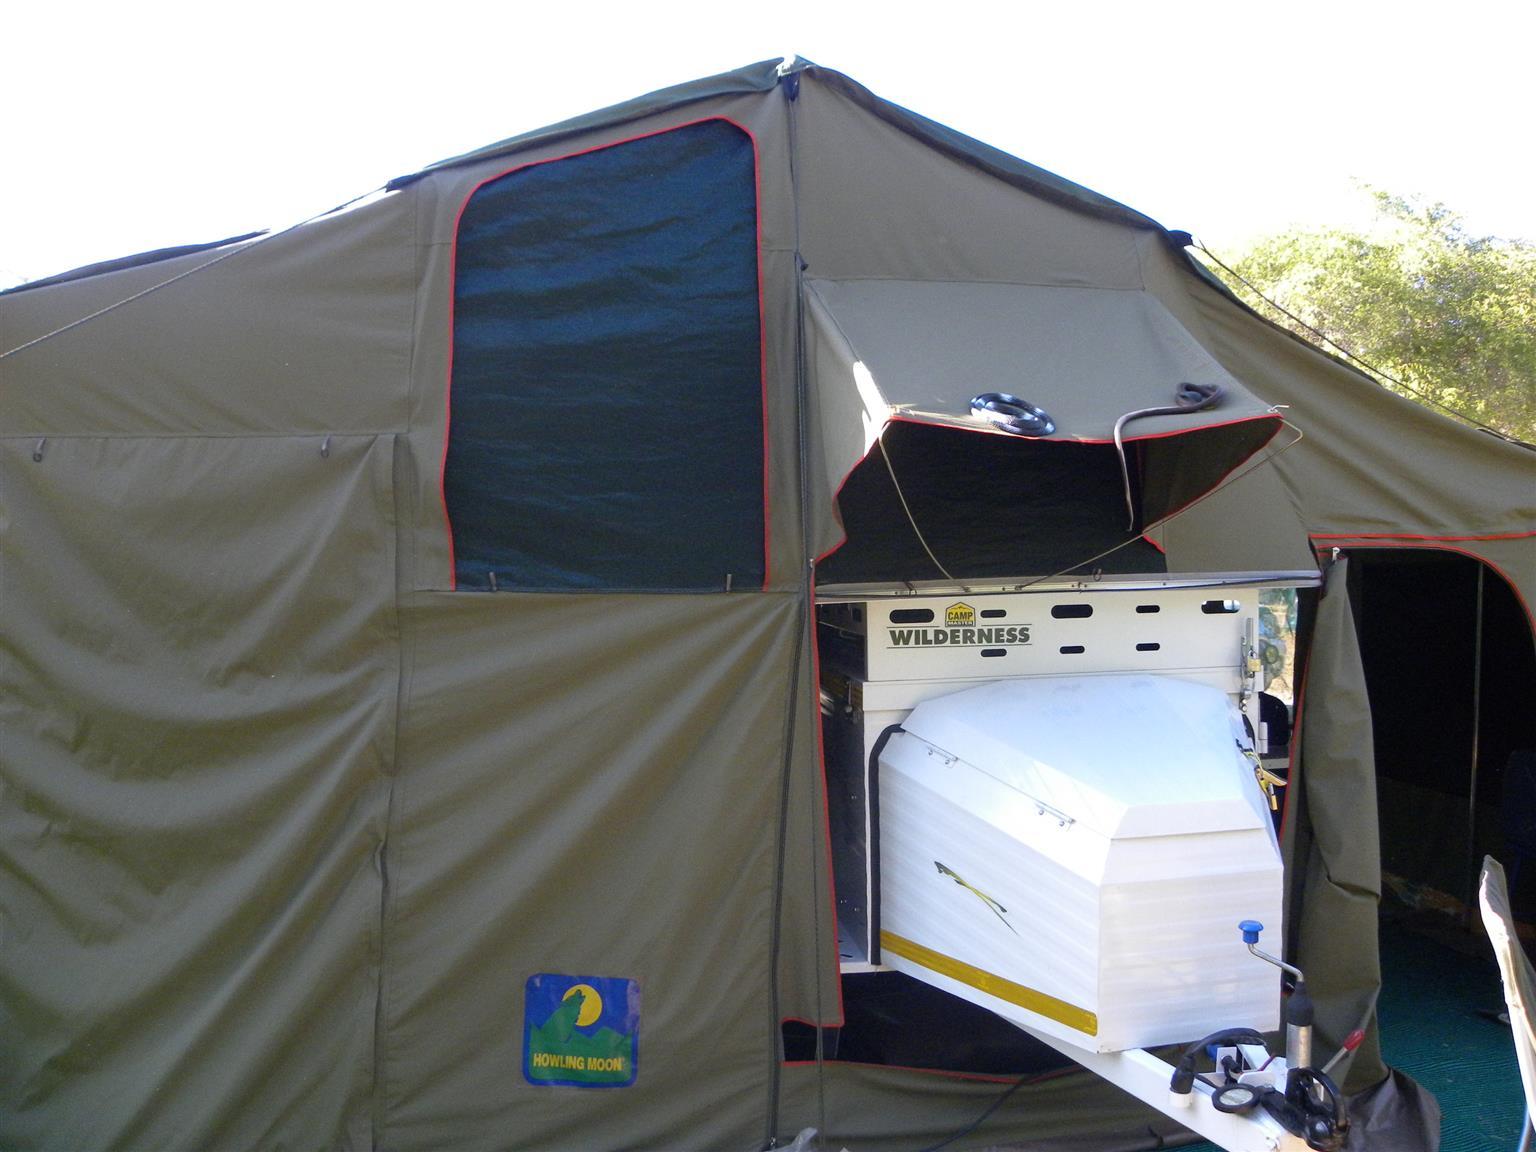 Howling moon 2010 model trailer Tent (Deluxe Trailer Tent)